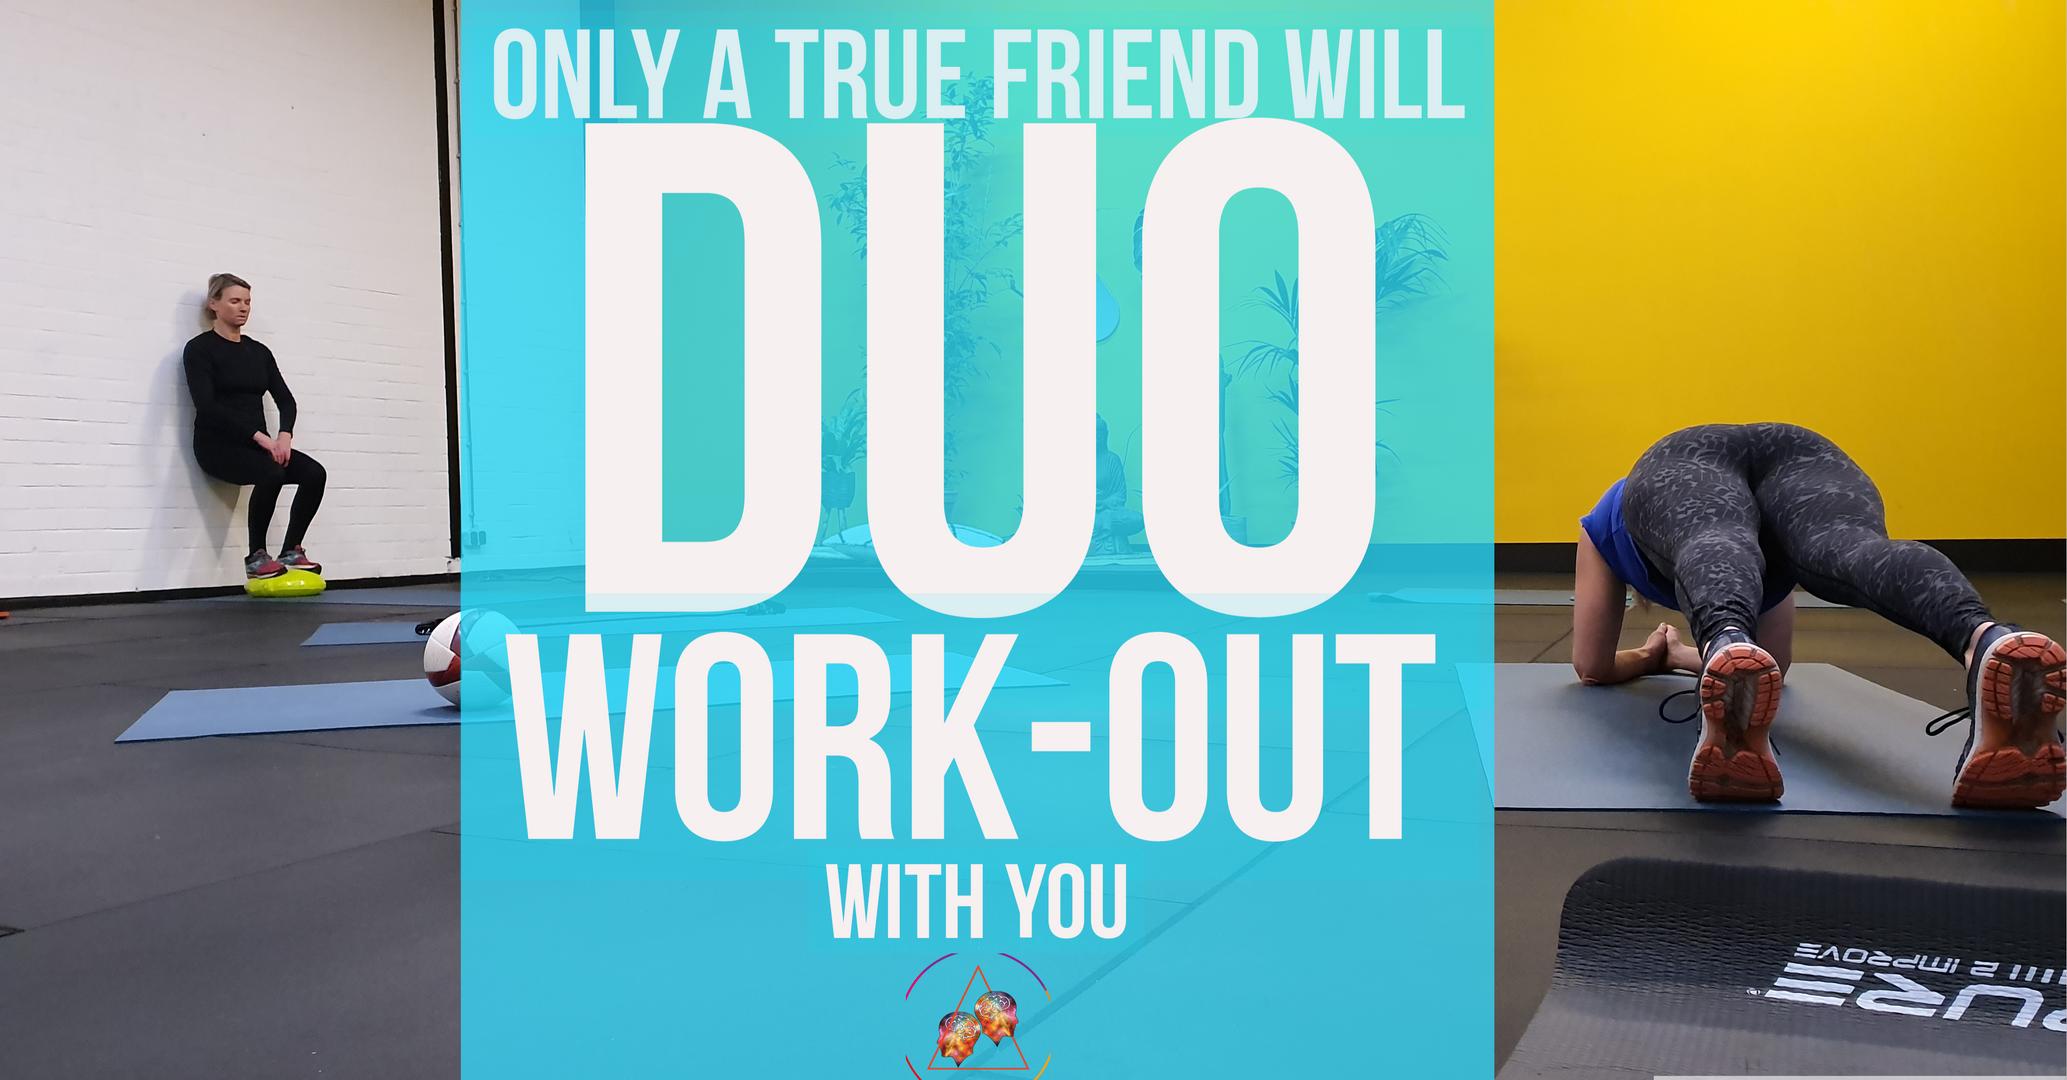 Met welke vriend(in) wil jij?